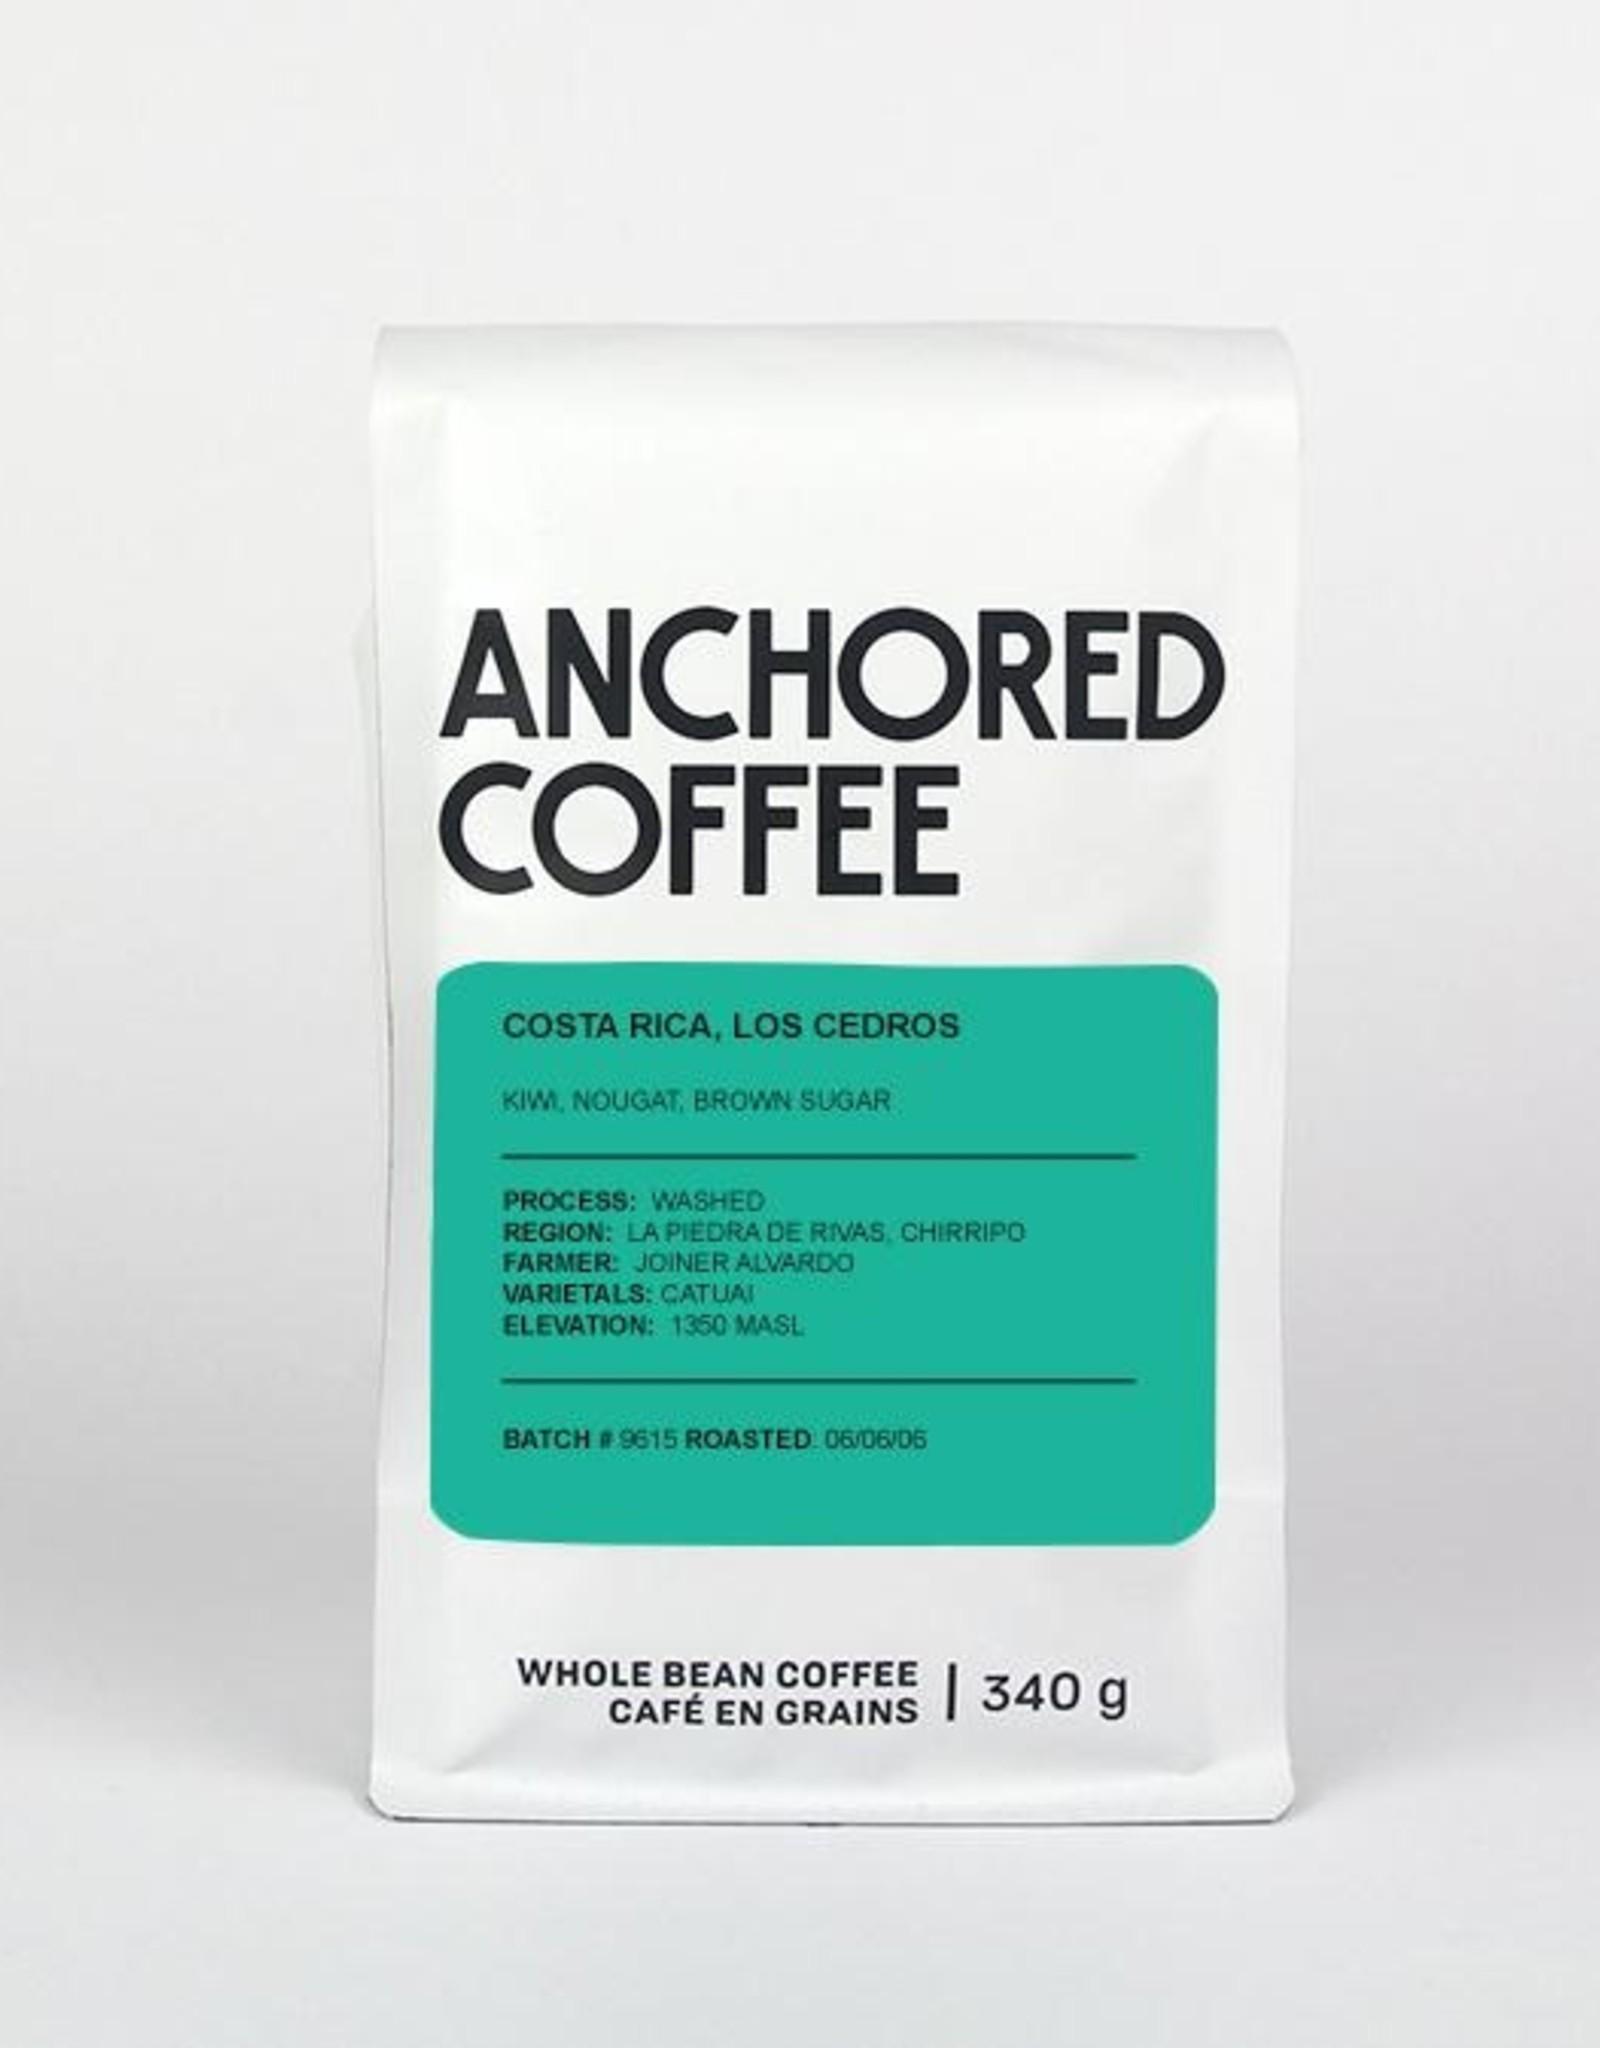 Café Anchored - Costa Rica, Los Cedros - Filtre -  340g